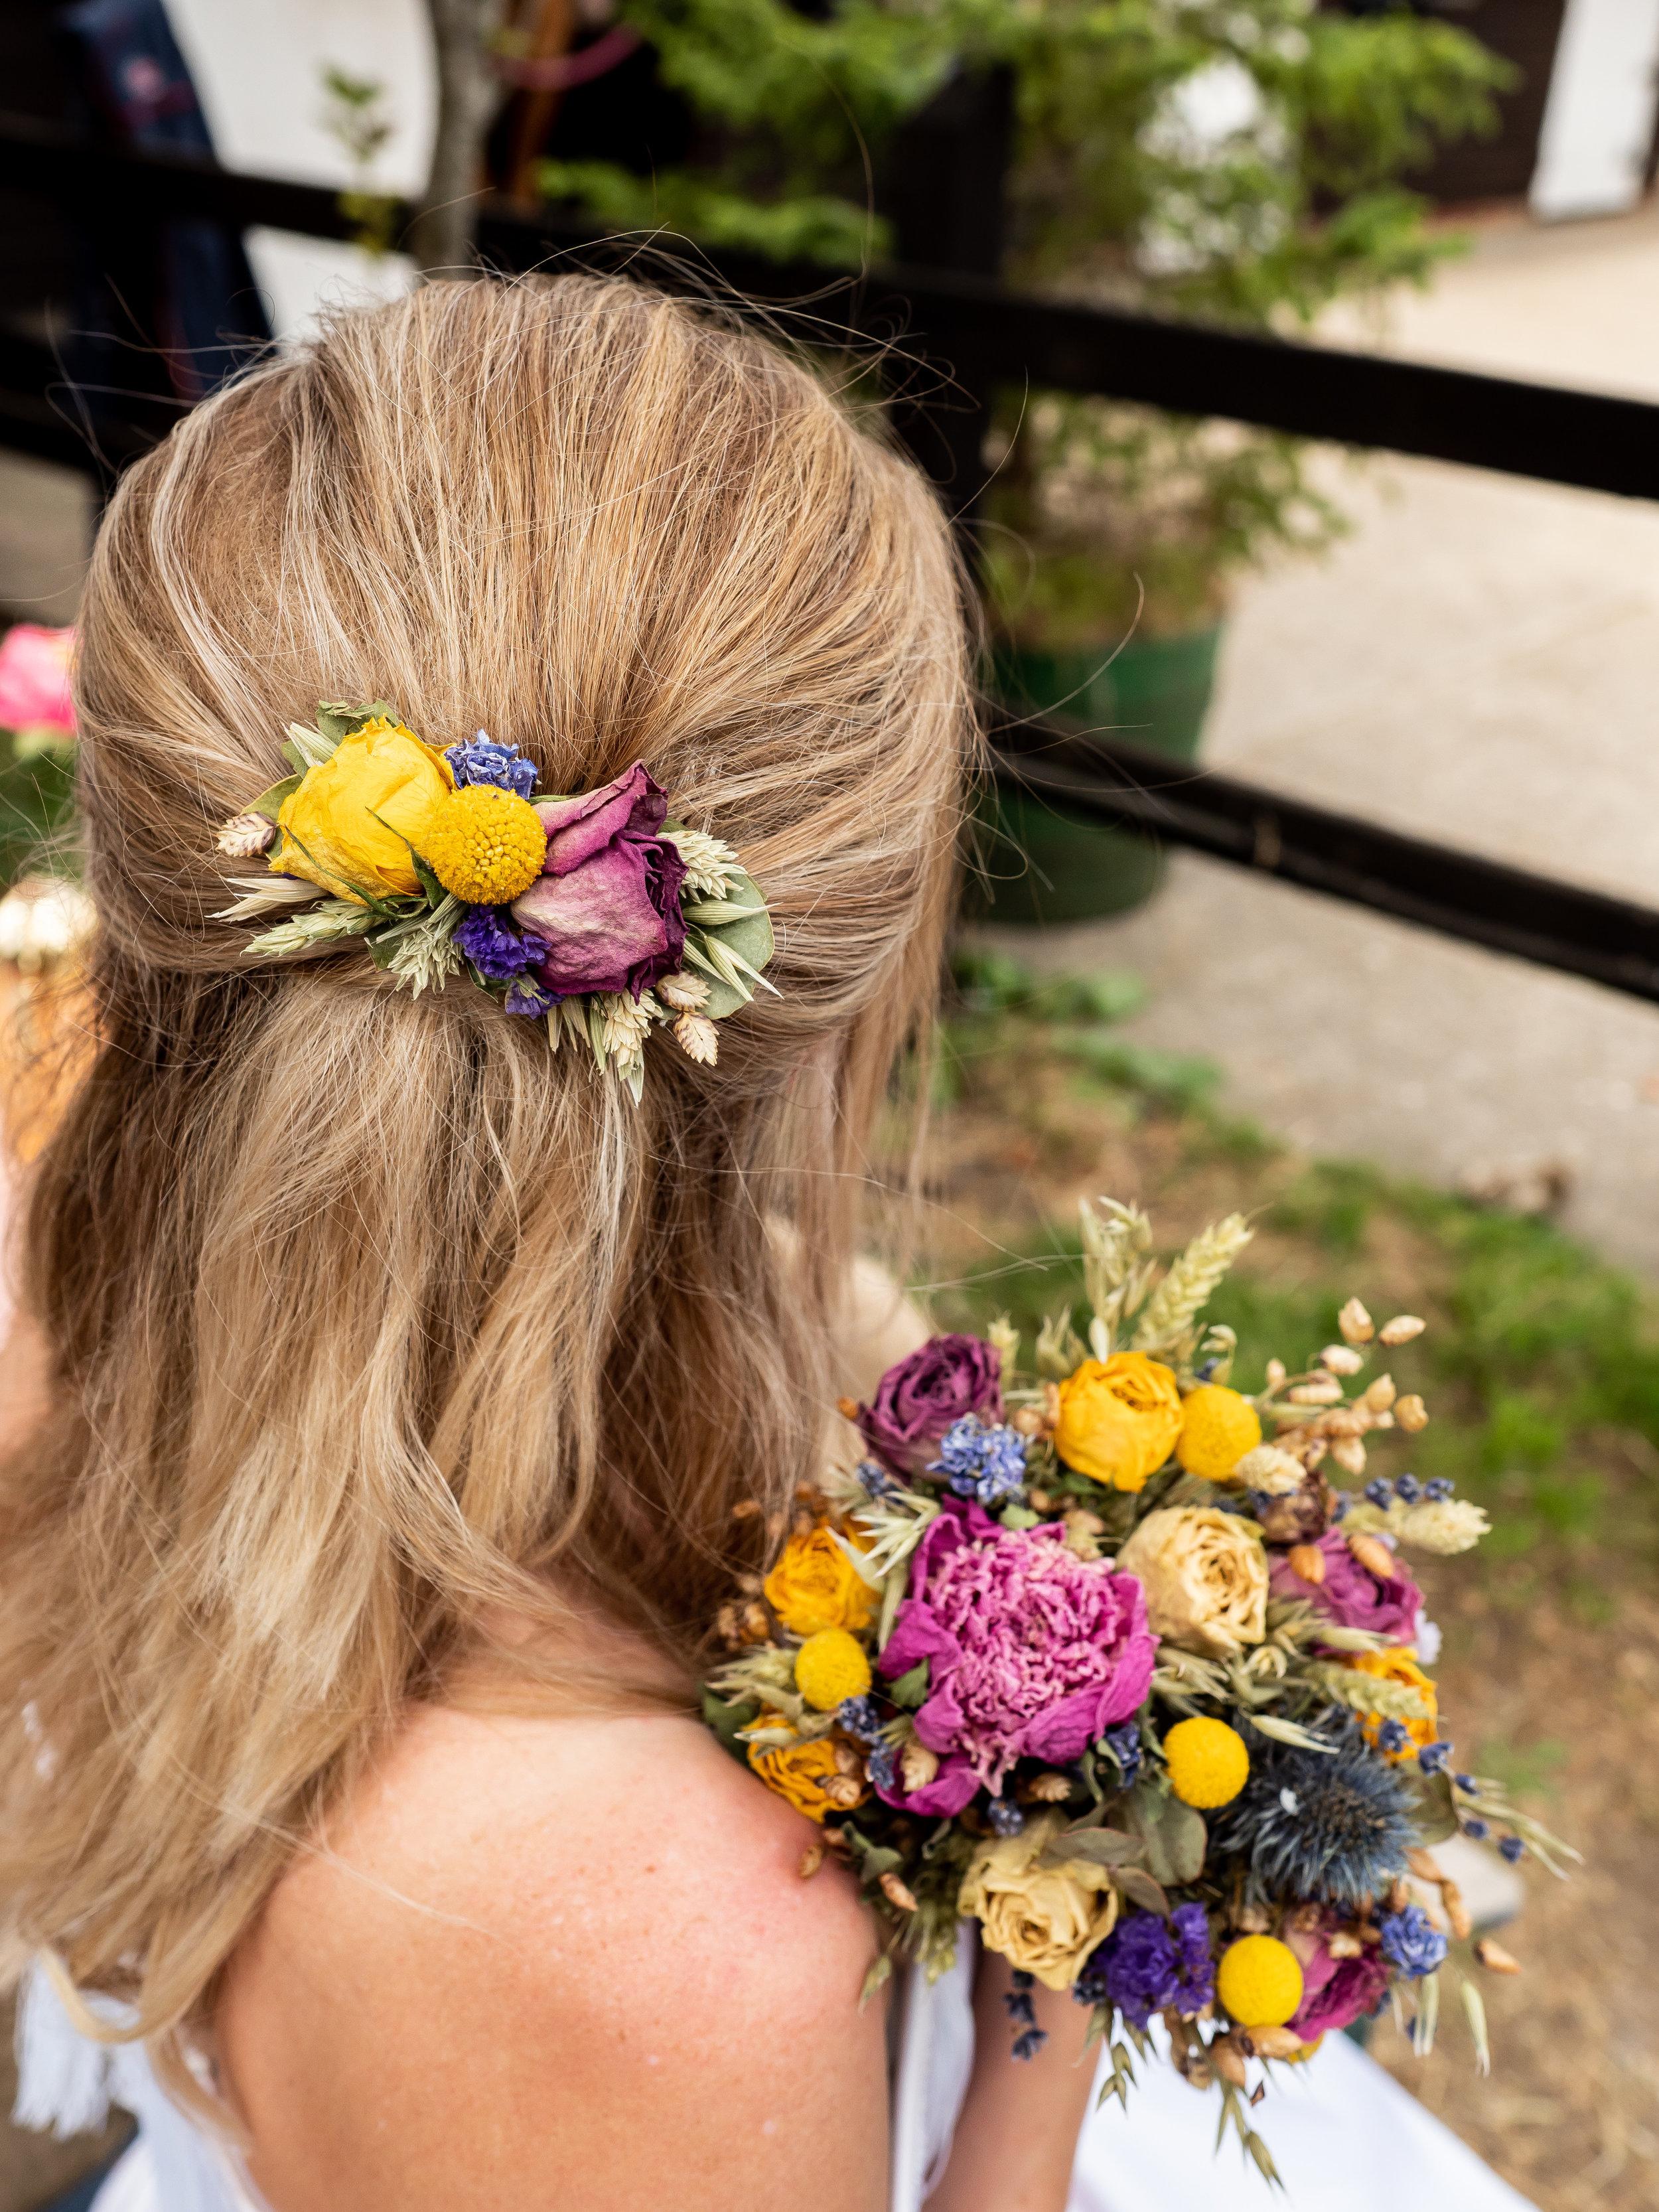 Jessica-Milberg-Photography-Brighton-London-Wedding-Fashion-Photographer-Creative-Wedding-Dress-59.jpg